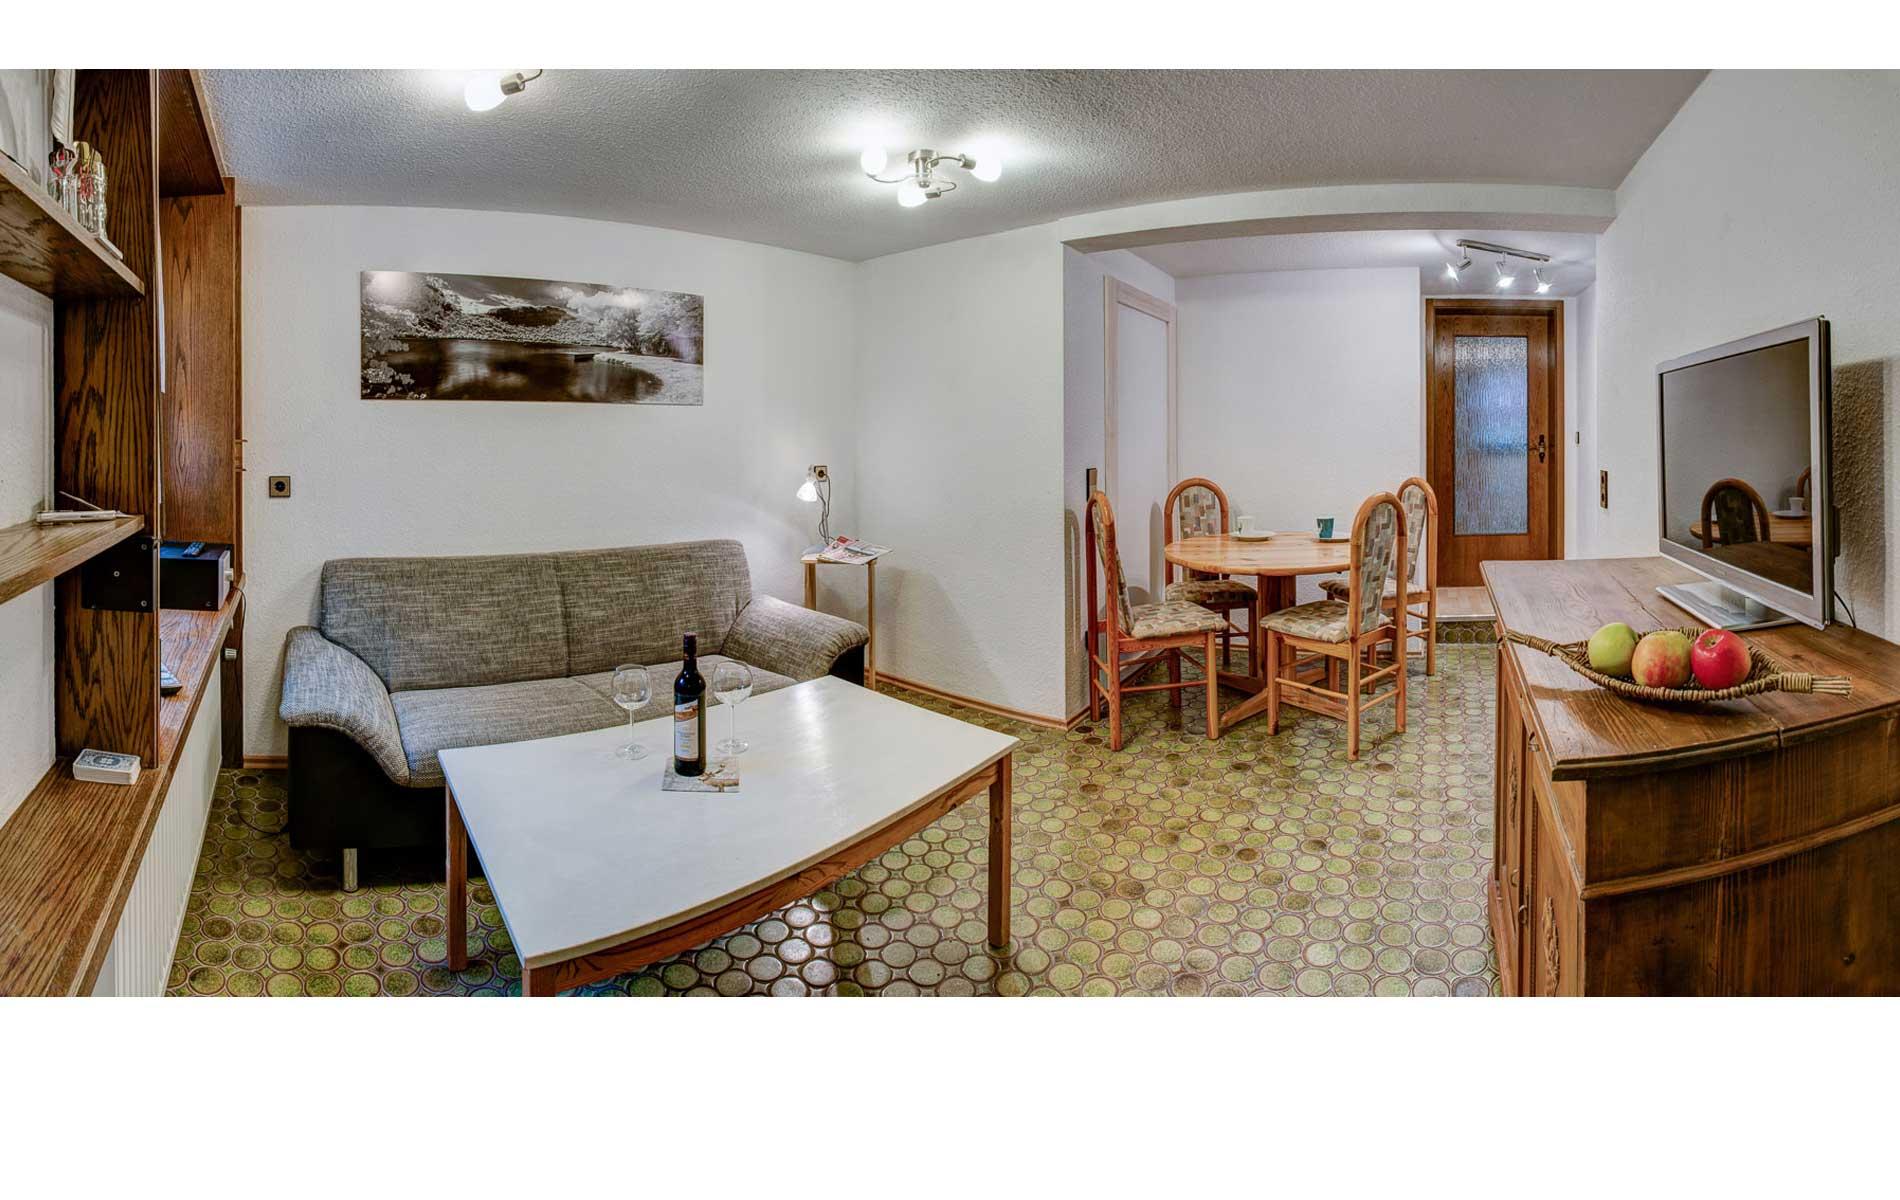 essecke haus am bergle. Black Bedroom Furniture Sets. Home Design Ideas